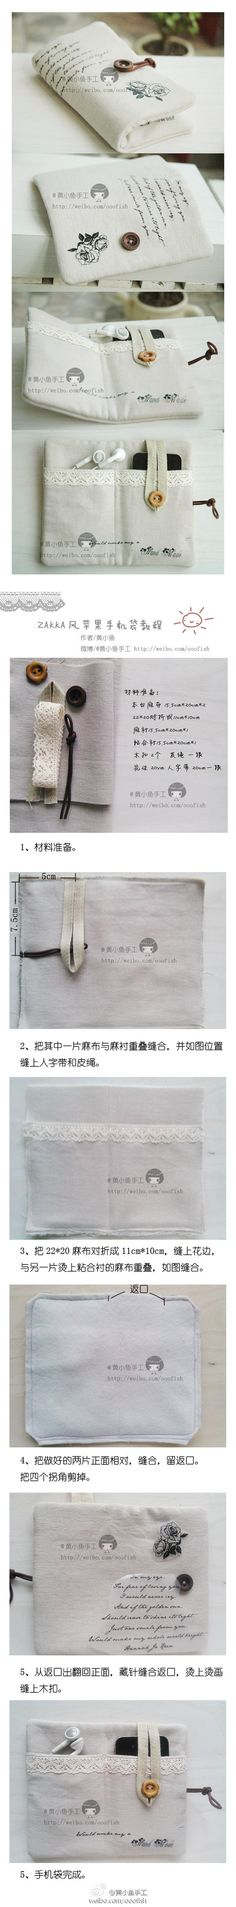 Apple cell phone pocket tutorial